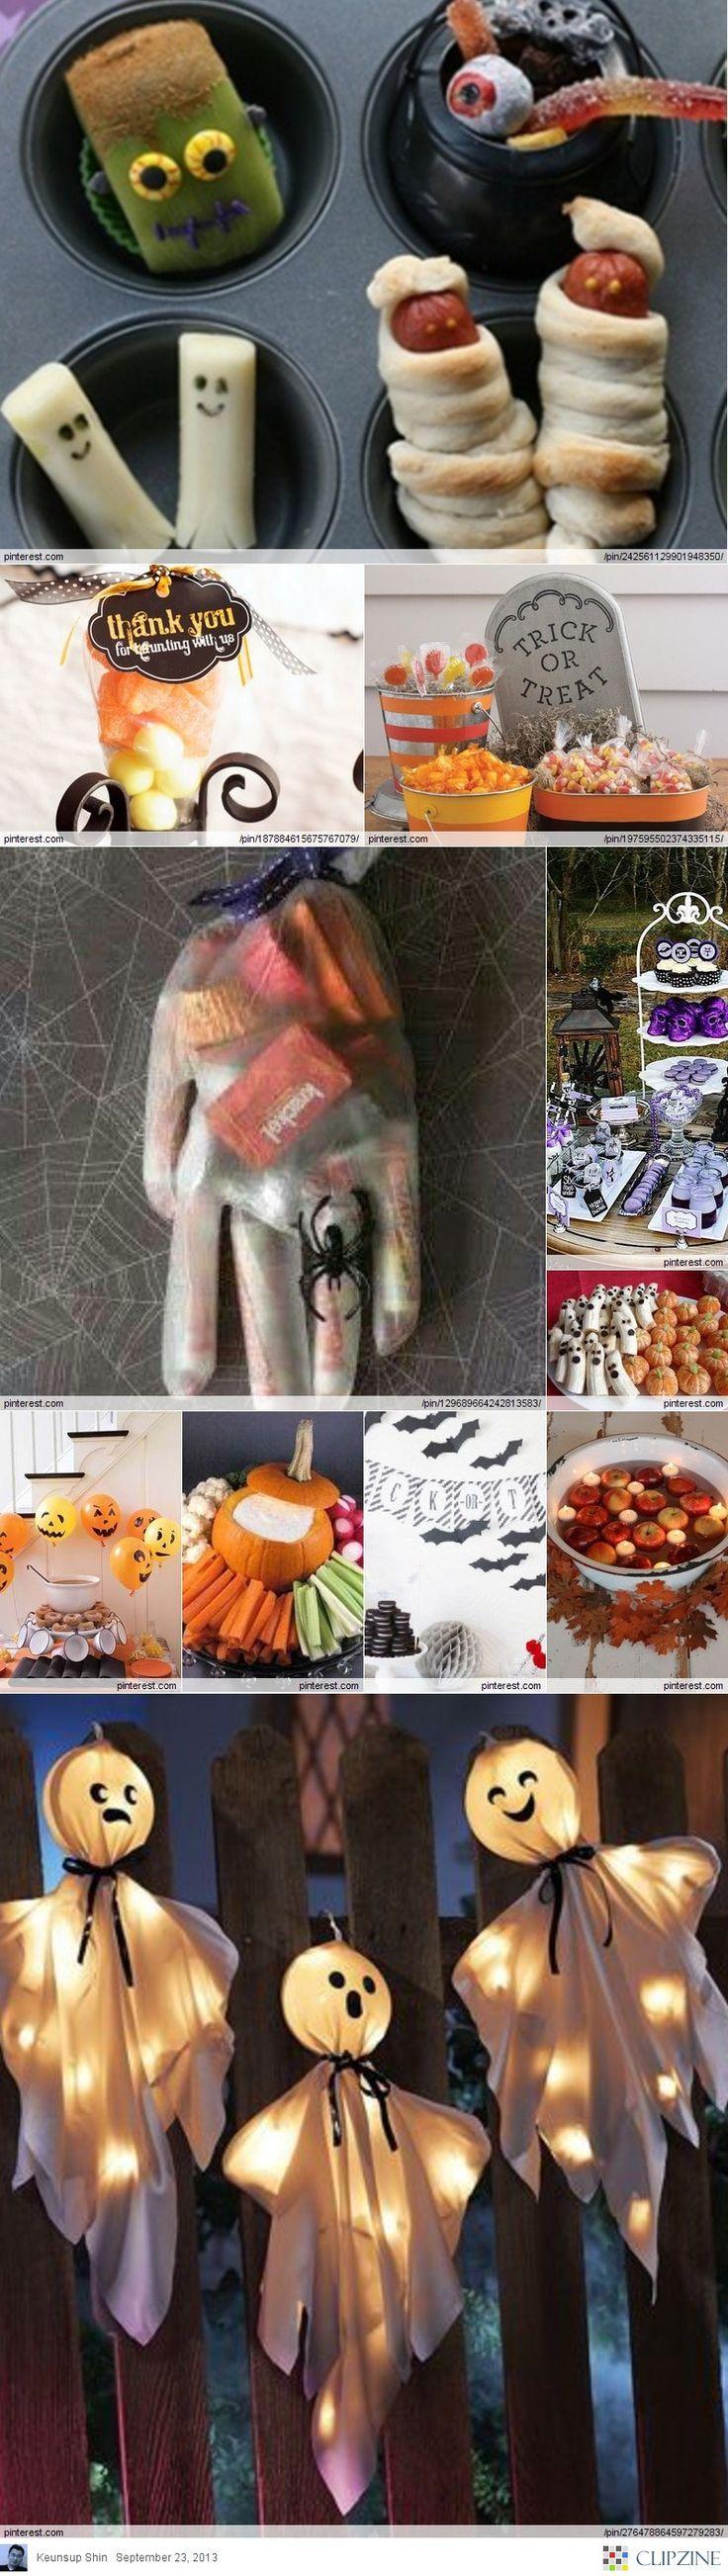 Halloween Party Ideas & Activities